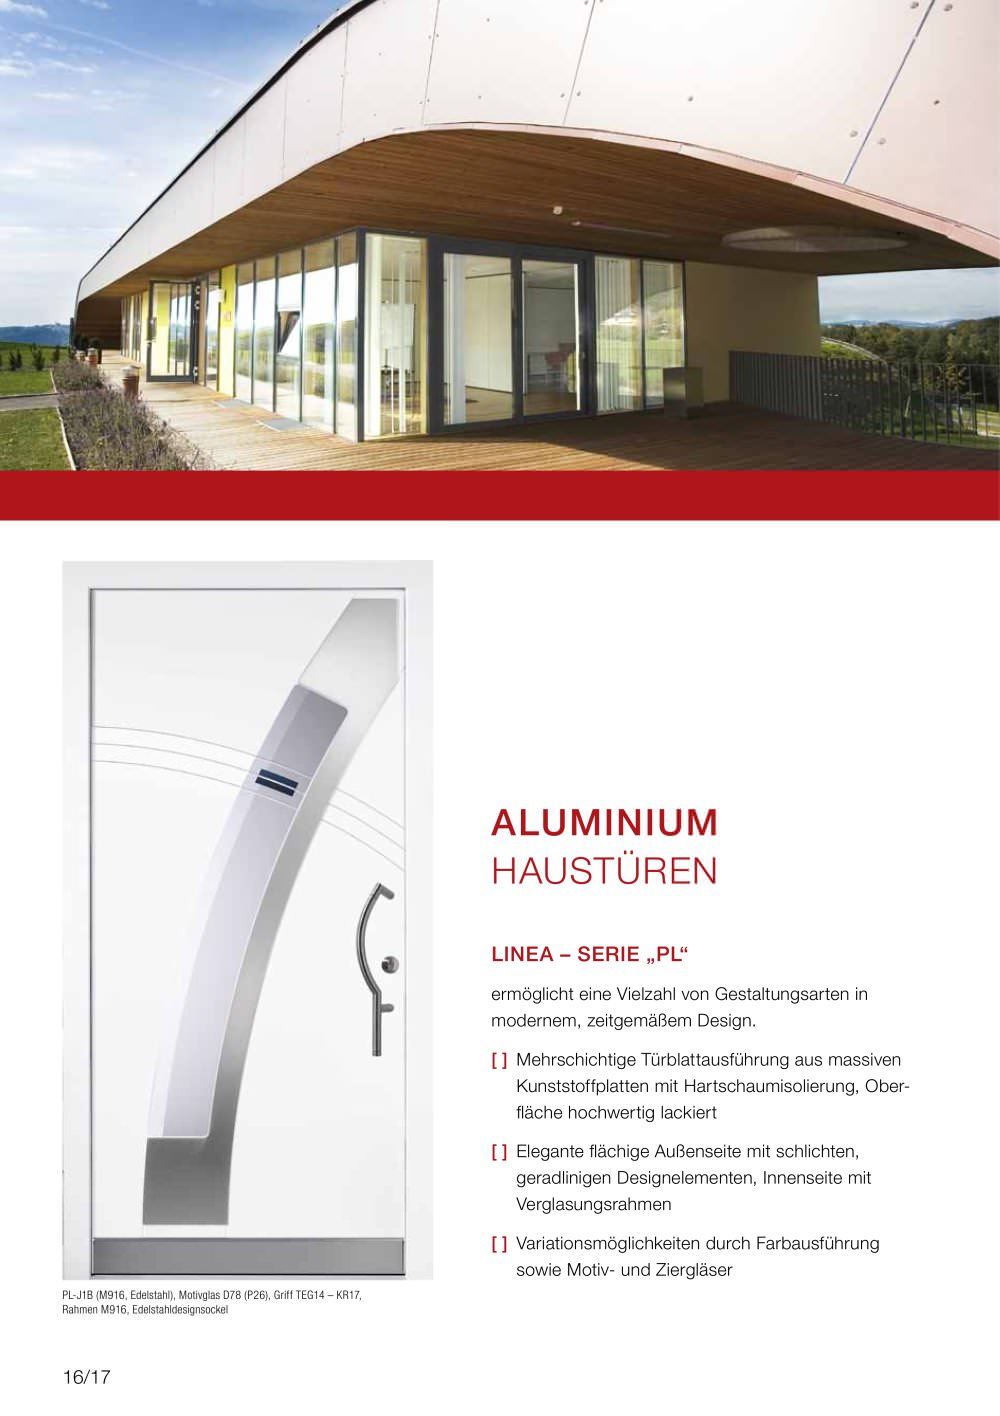 ALUMINIUM HAUSTÜREN - Internorm - PDF Katalog | Beschreibung | Prospekt